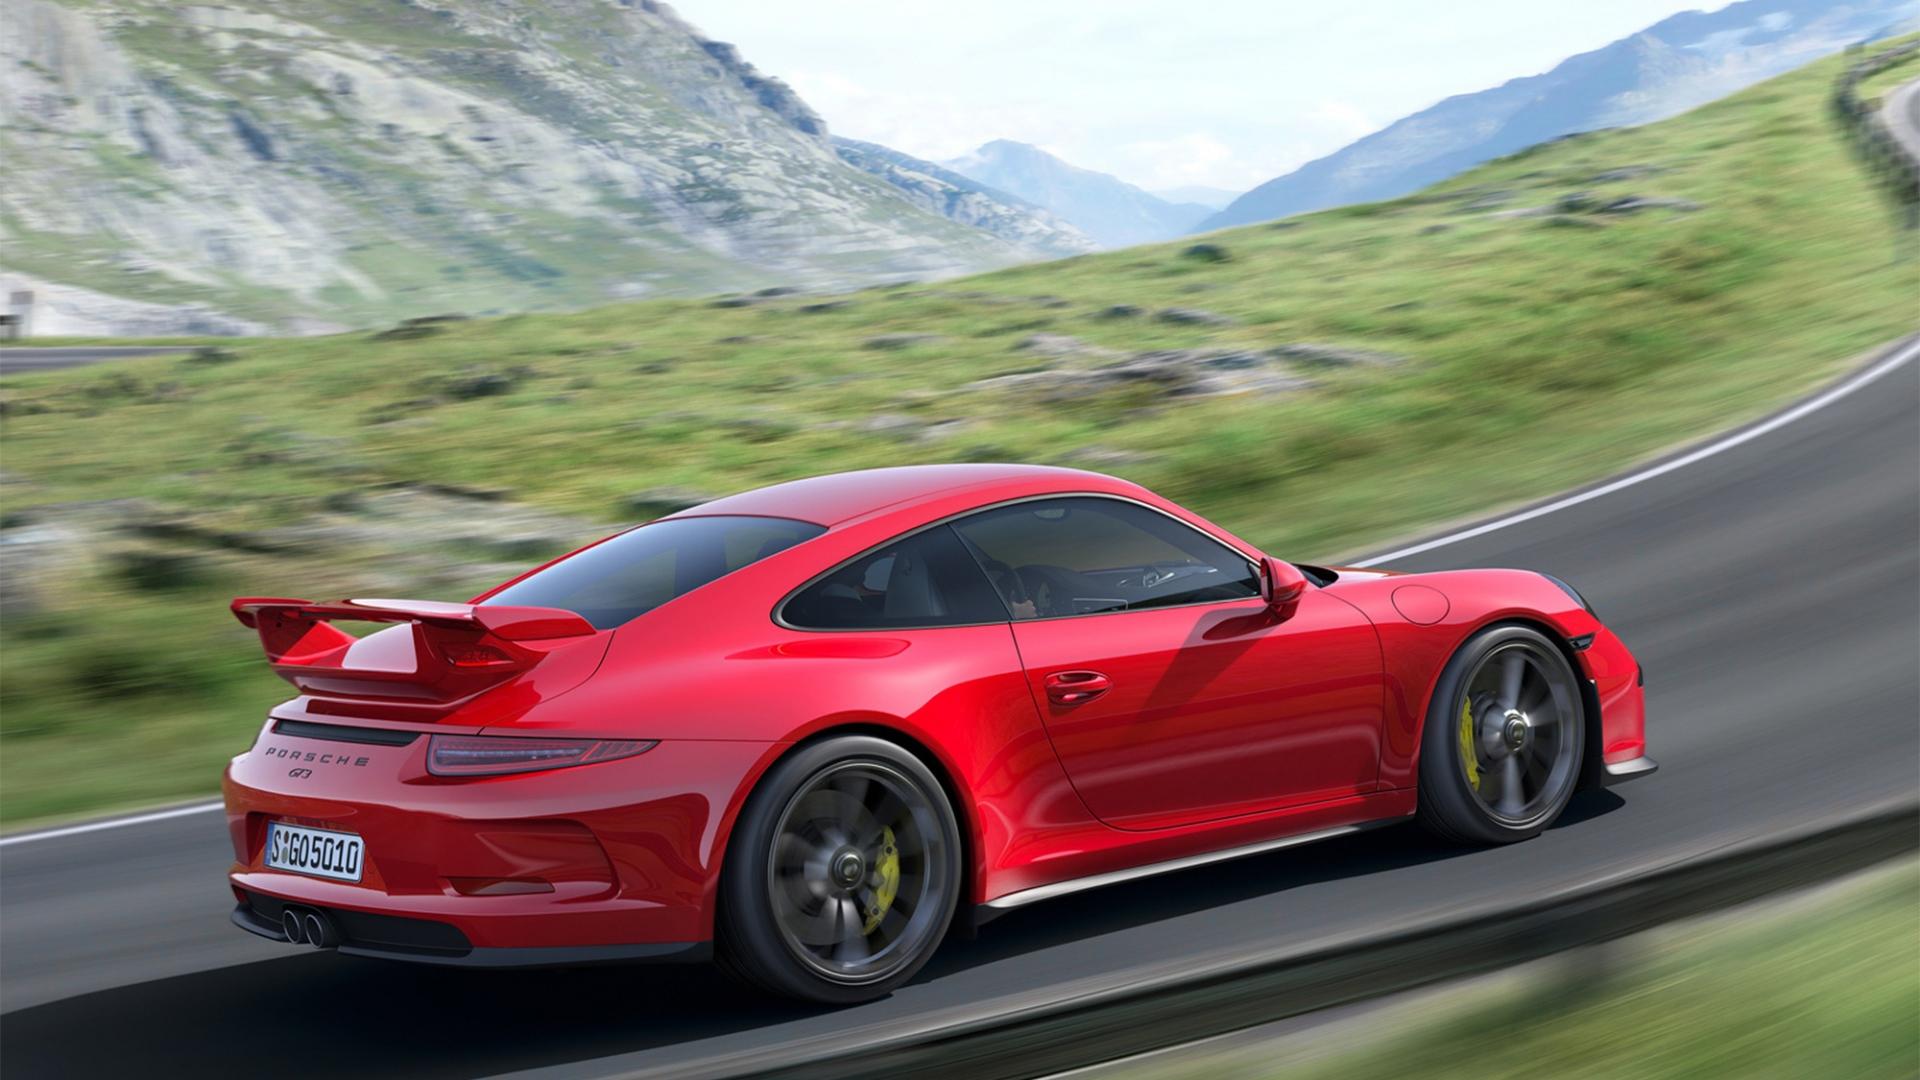 48+ Porsche HD Wallpapers 1080p on WallpaperSafari